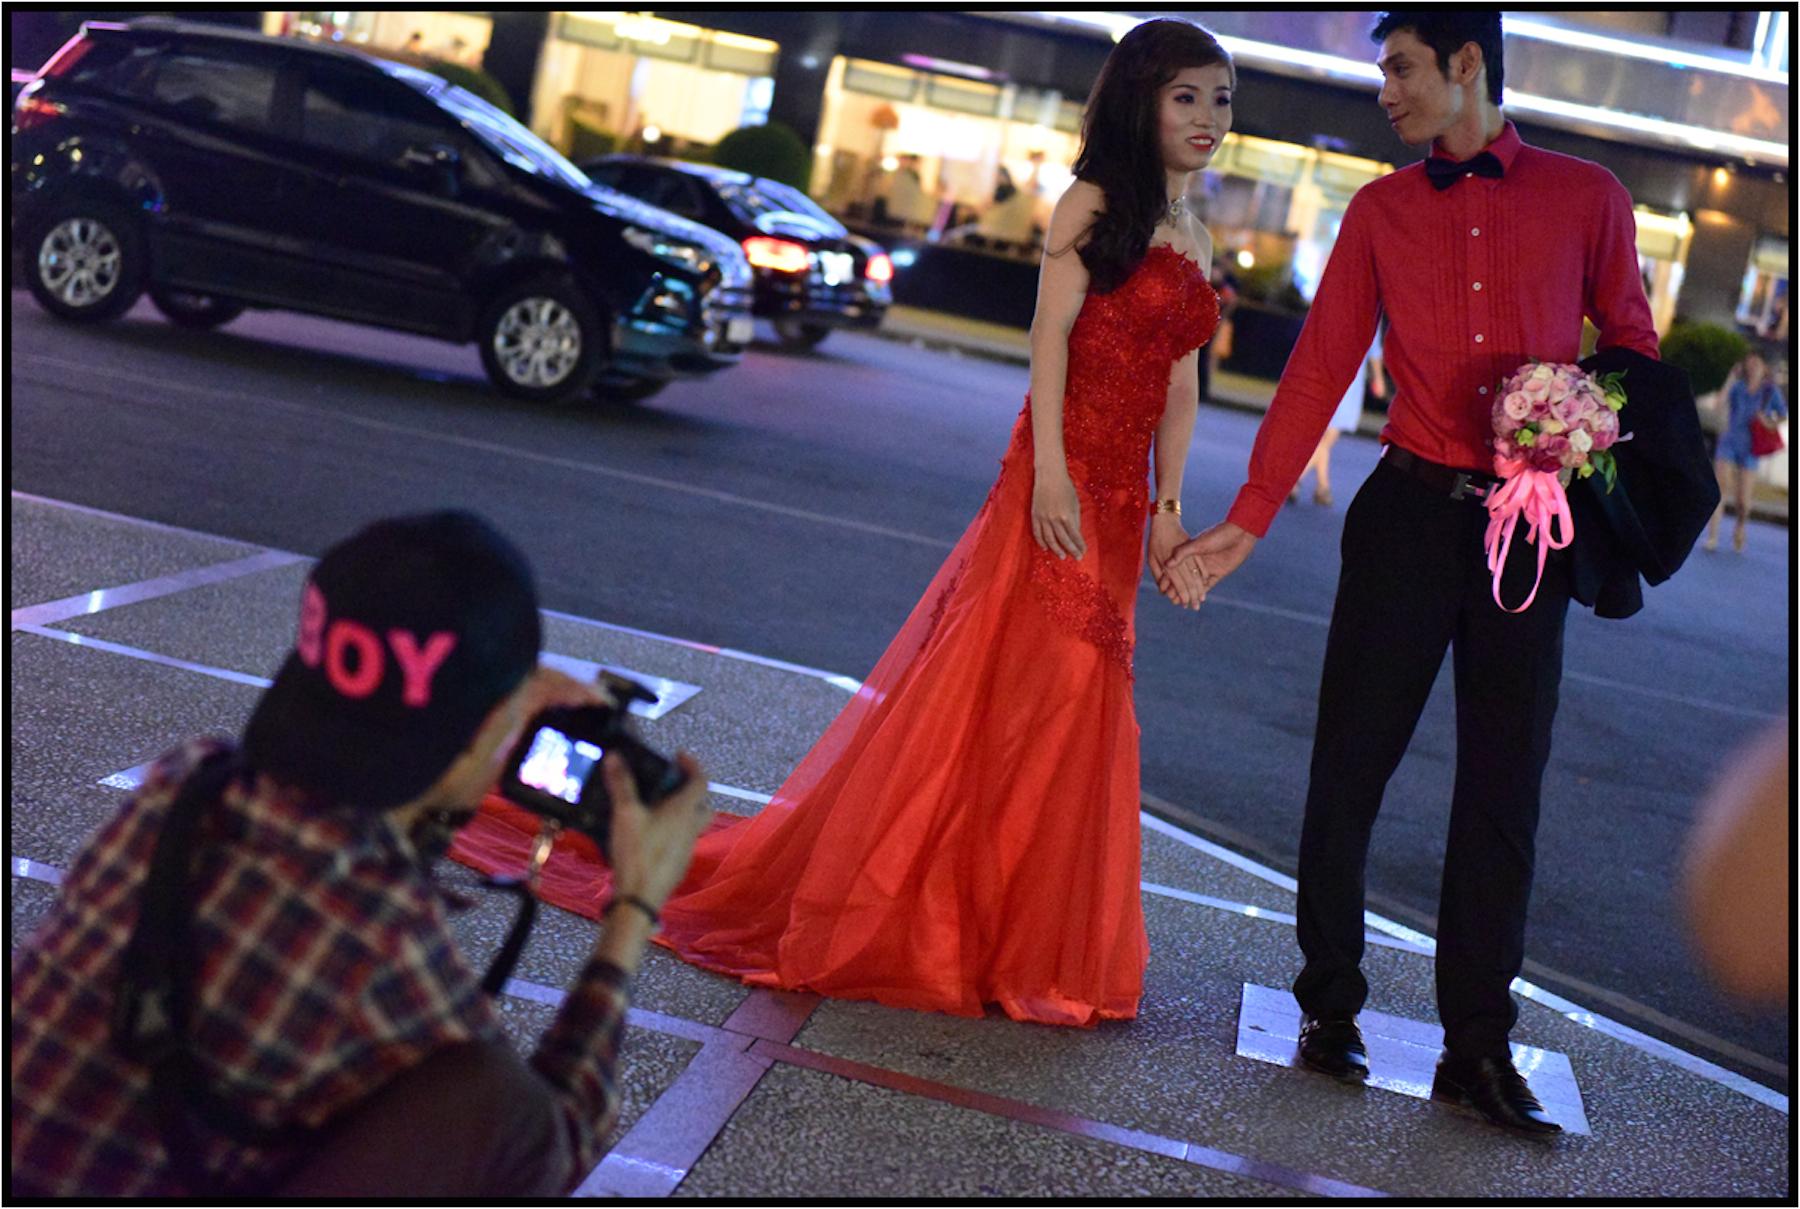 Wedding photography, Saigon/HCMC, Dec. 2015. #2079